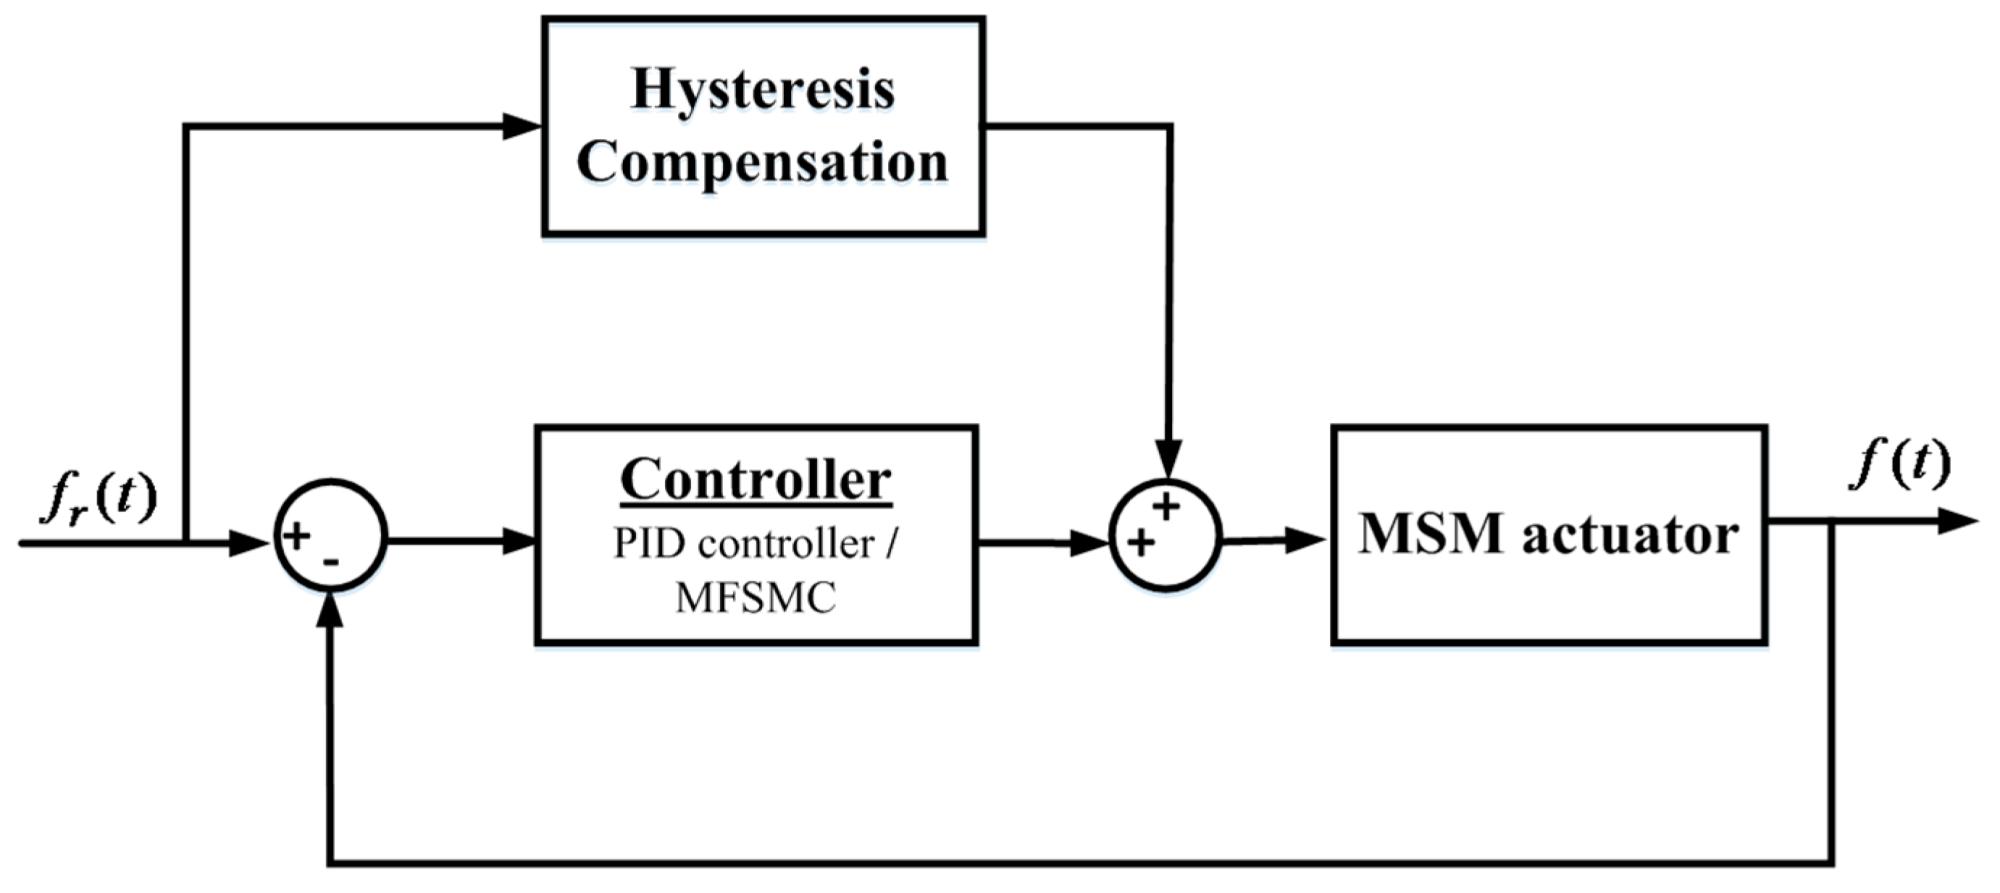 hight resolution of sensors 16 01368 g010 figure 10 block diagram